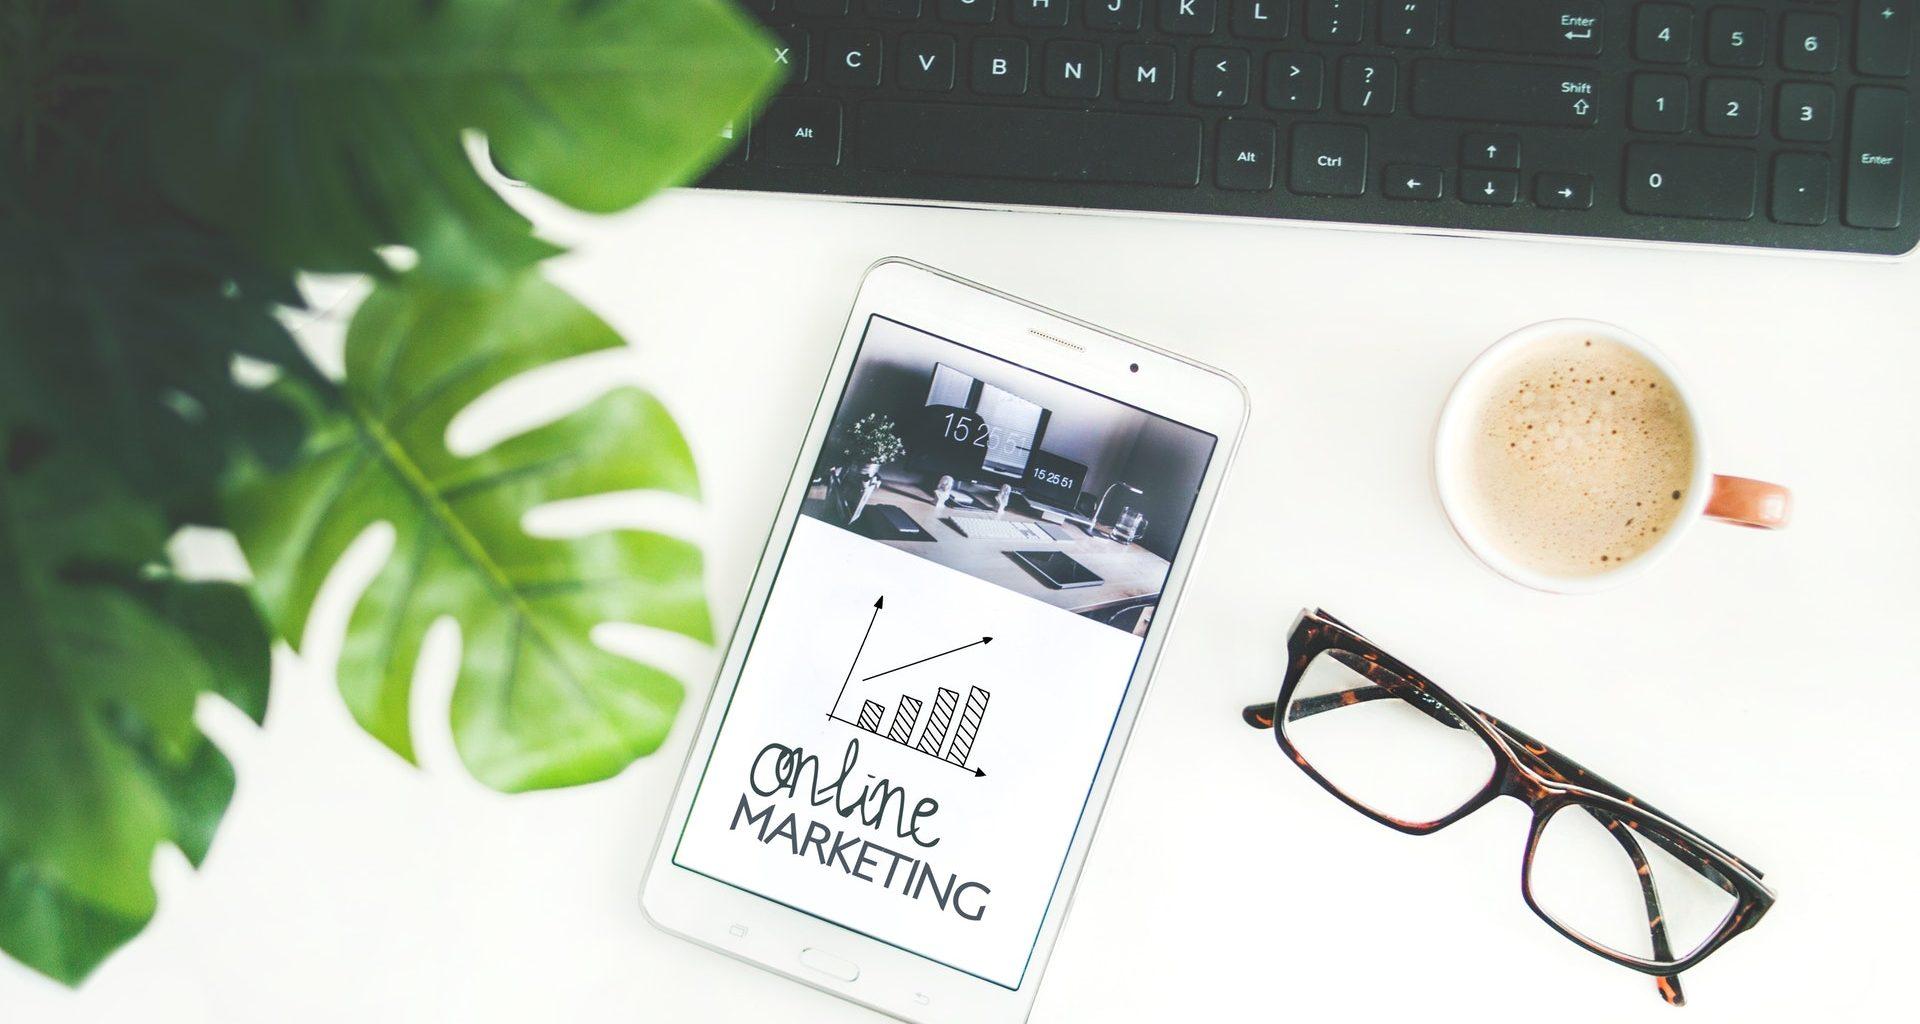 online marketing, computer, phone, glasses